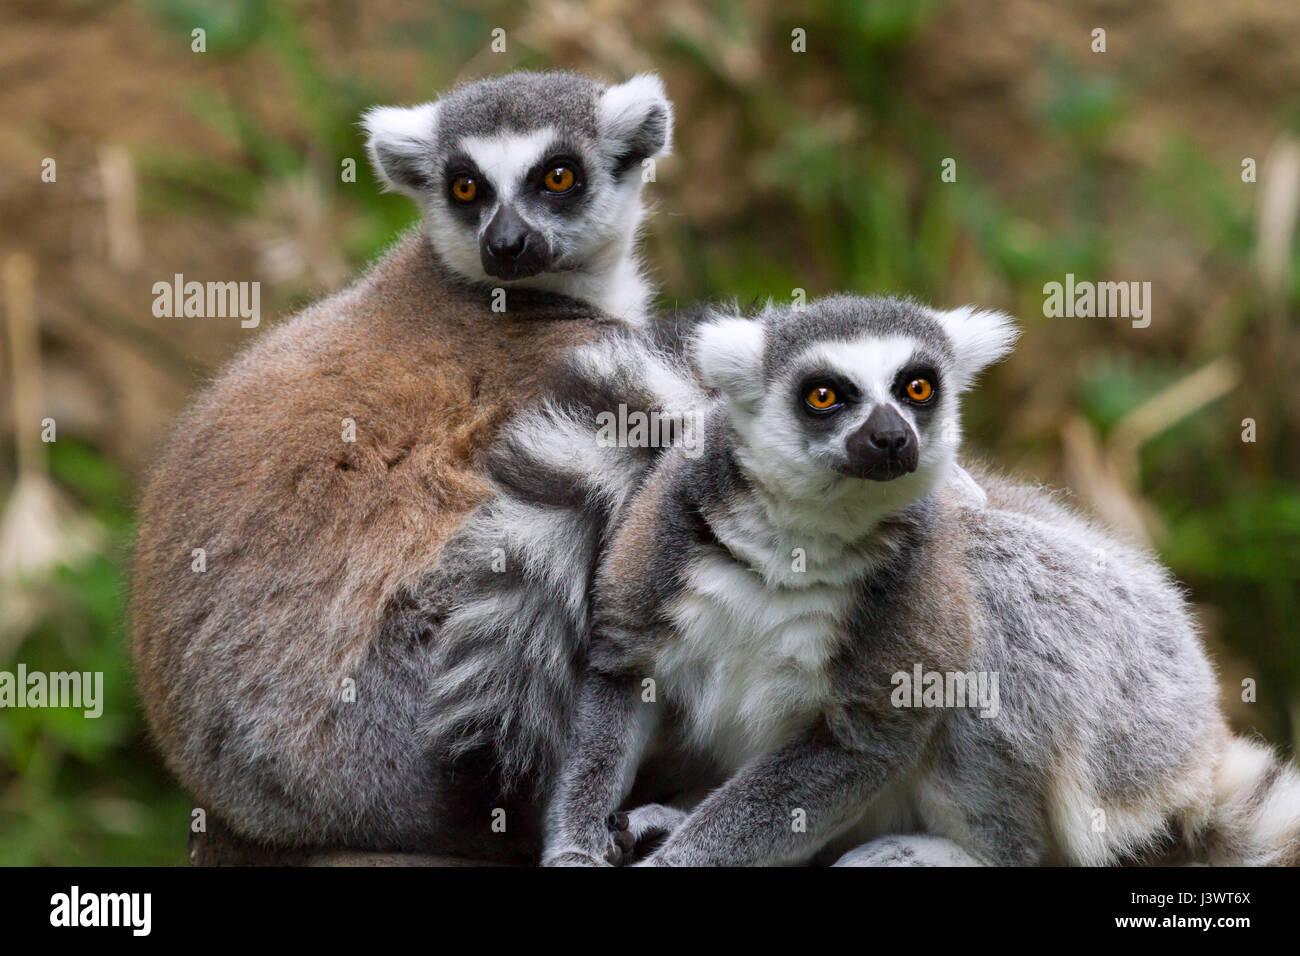 ring-tailed lemur (Lemur catta) at zoo, originally from Madagascar - Stock Image